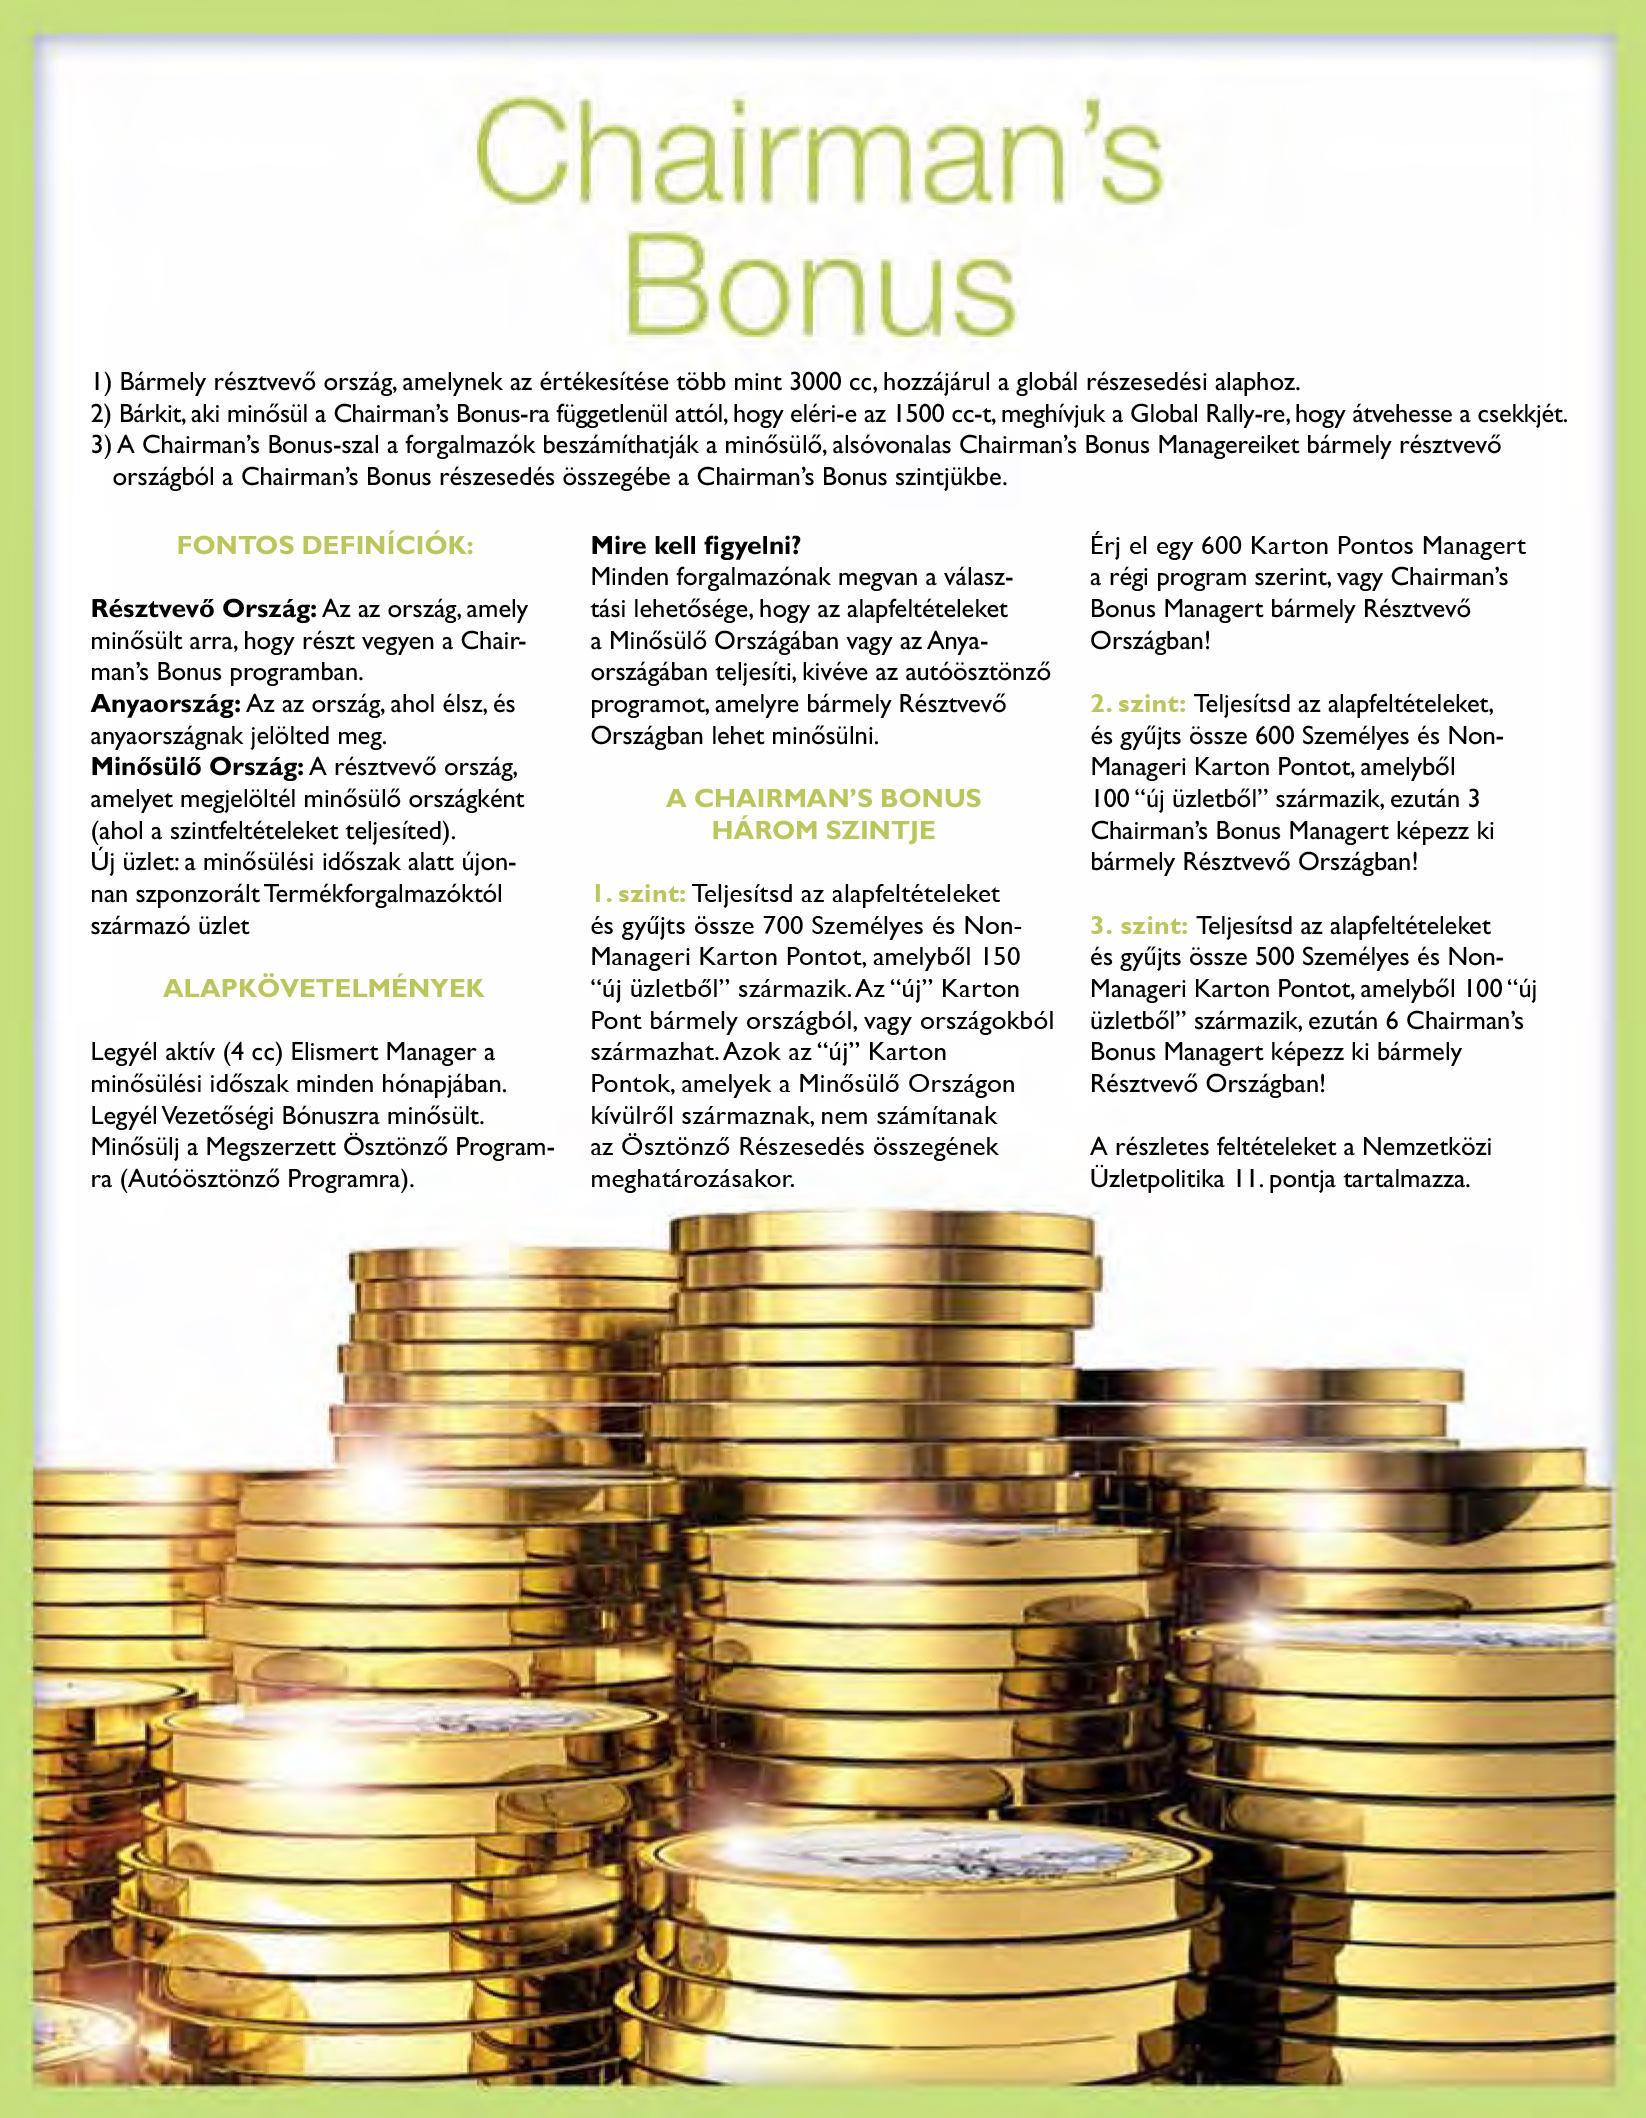 Chairman's Bonus 2015